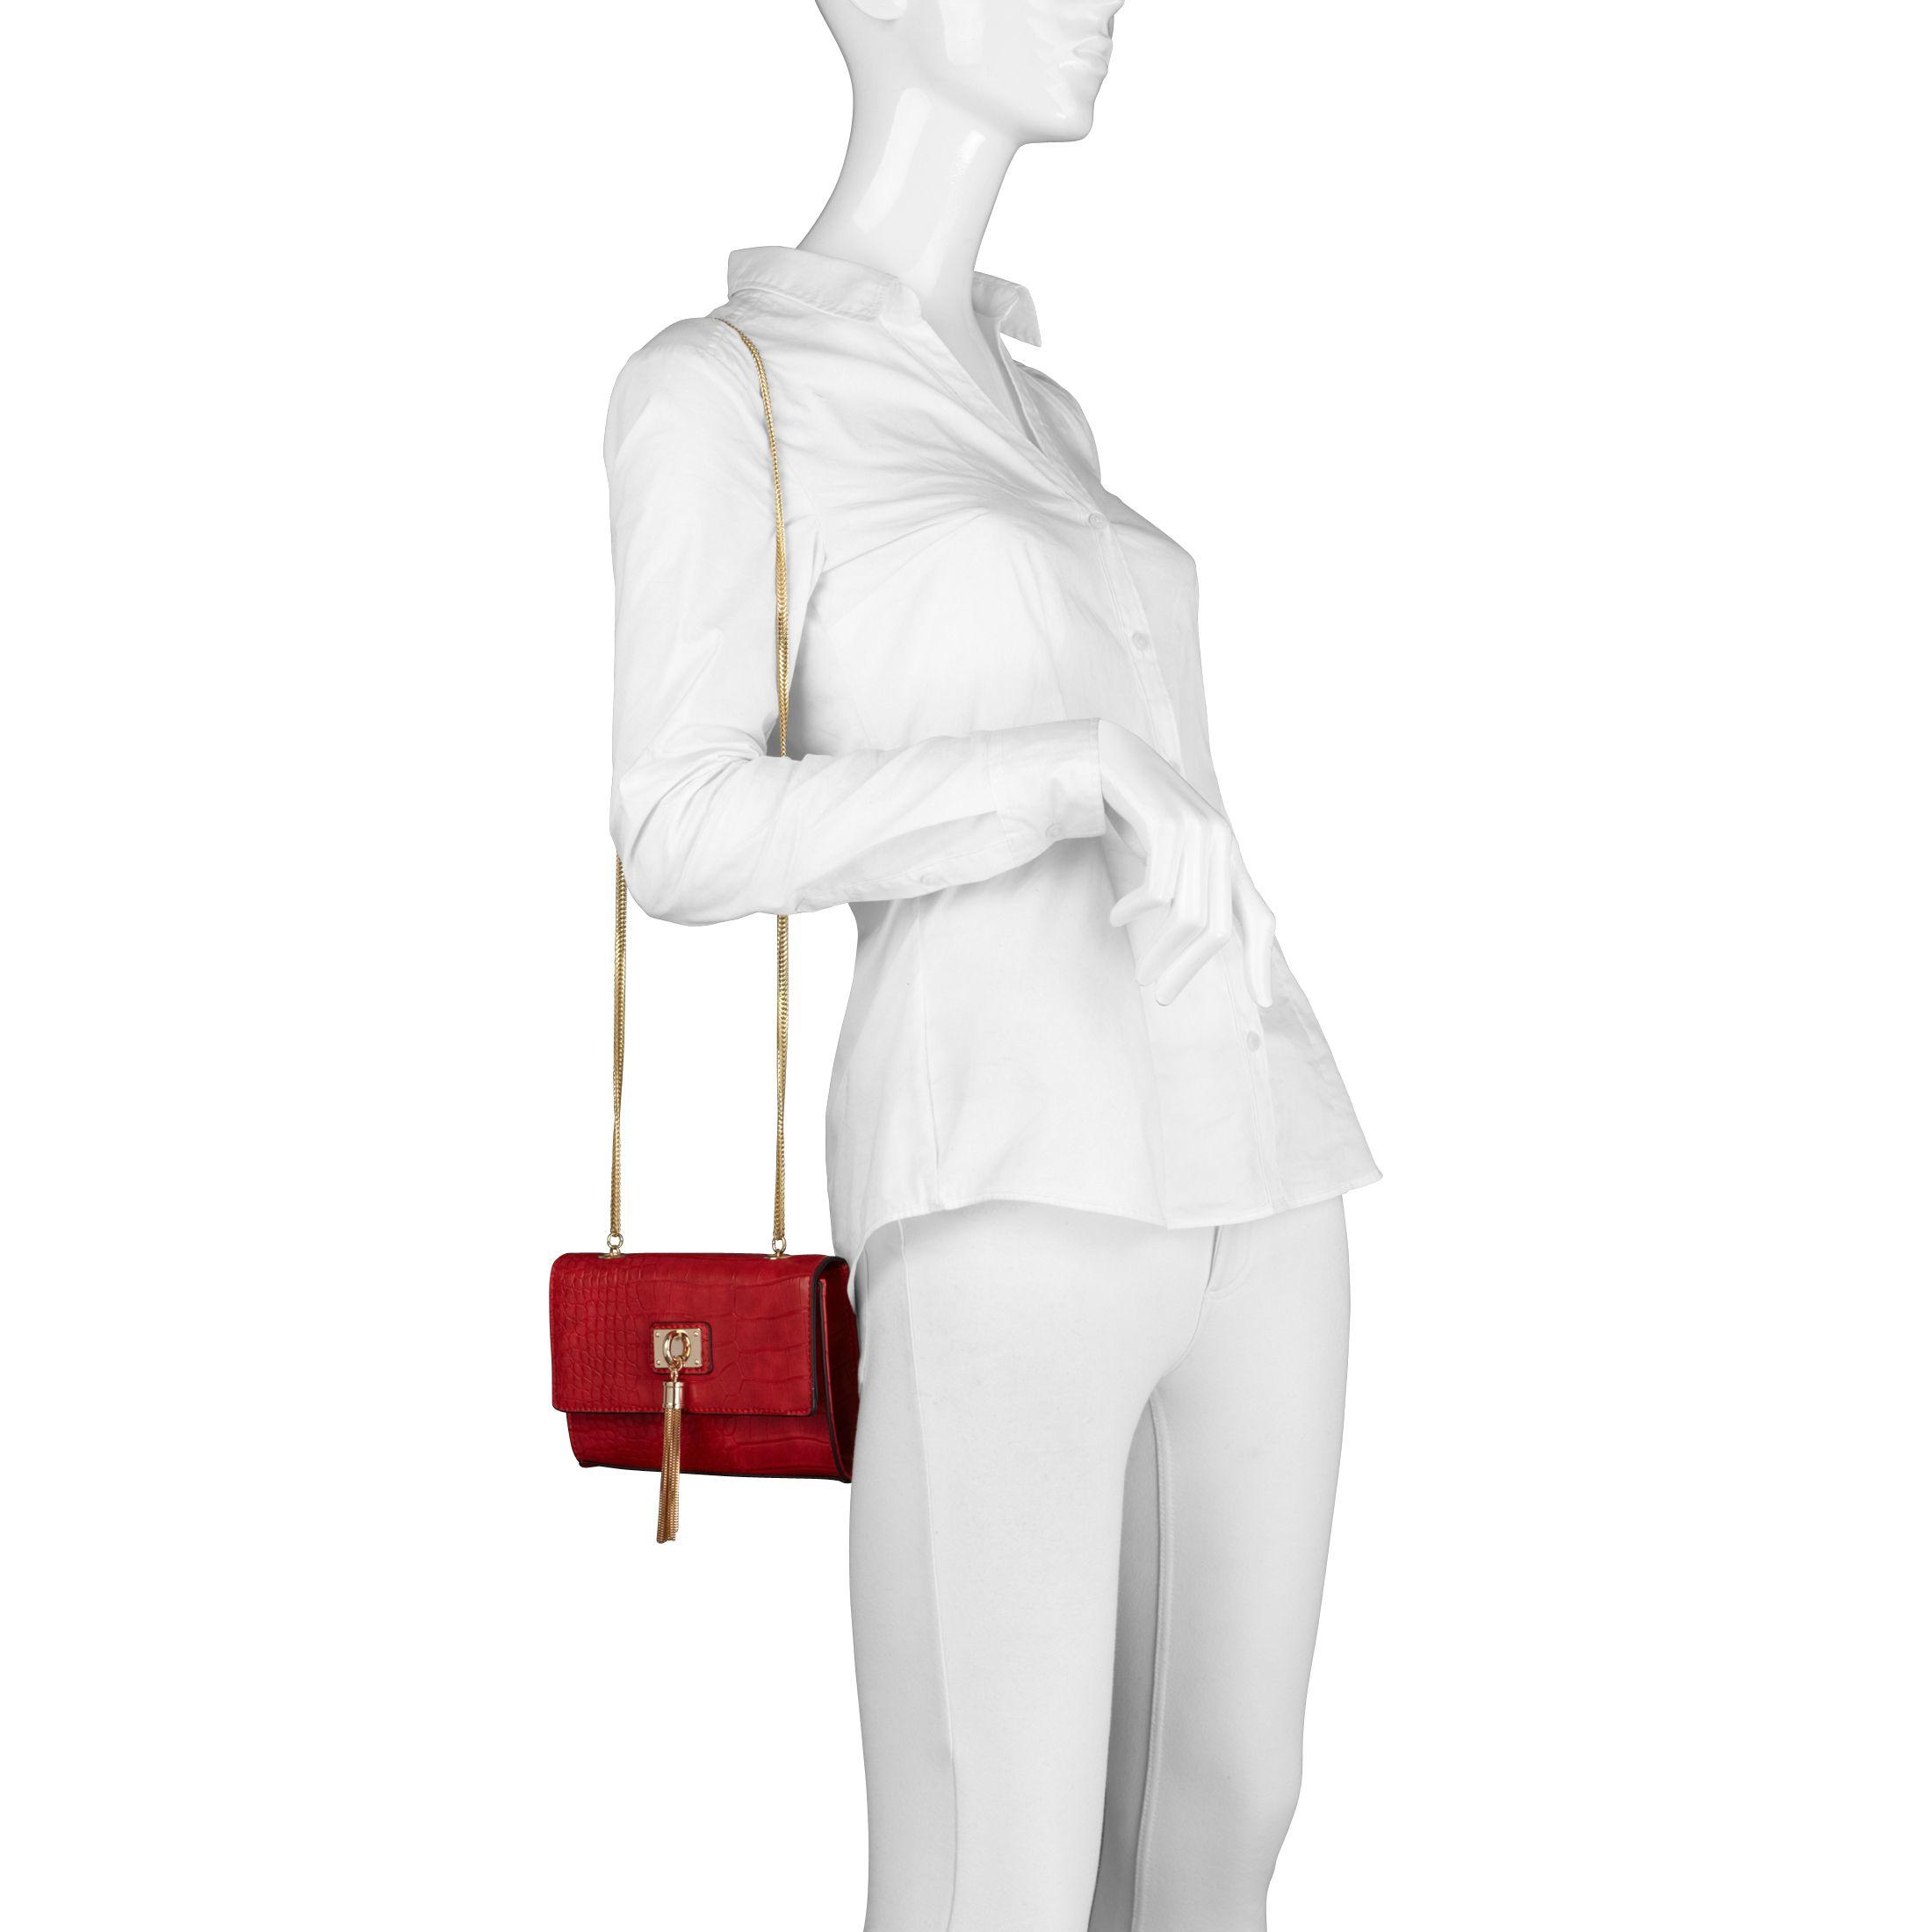 ALDO Harortland Chain Cross Body Bag in Red